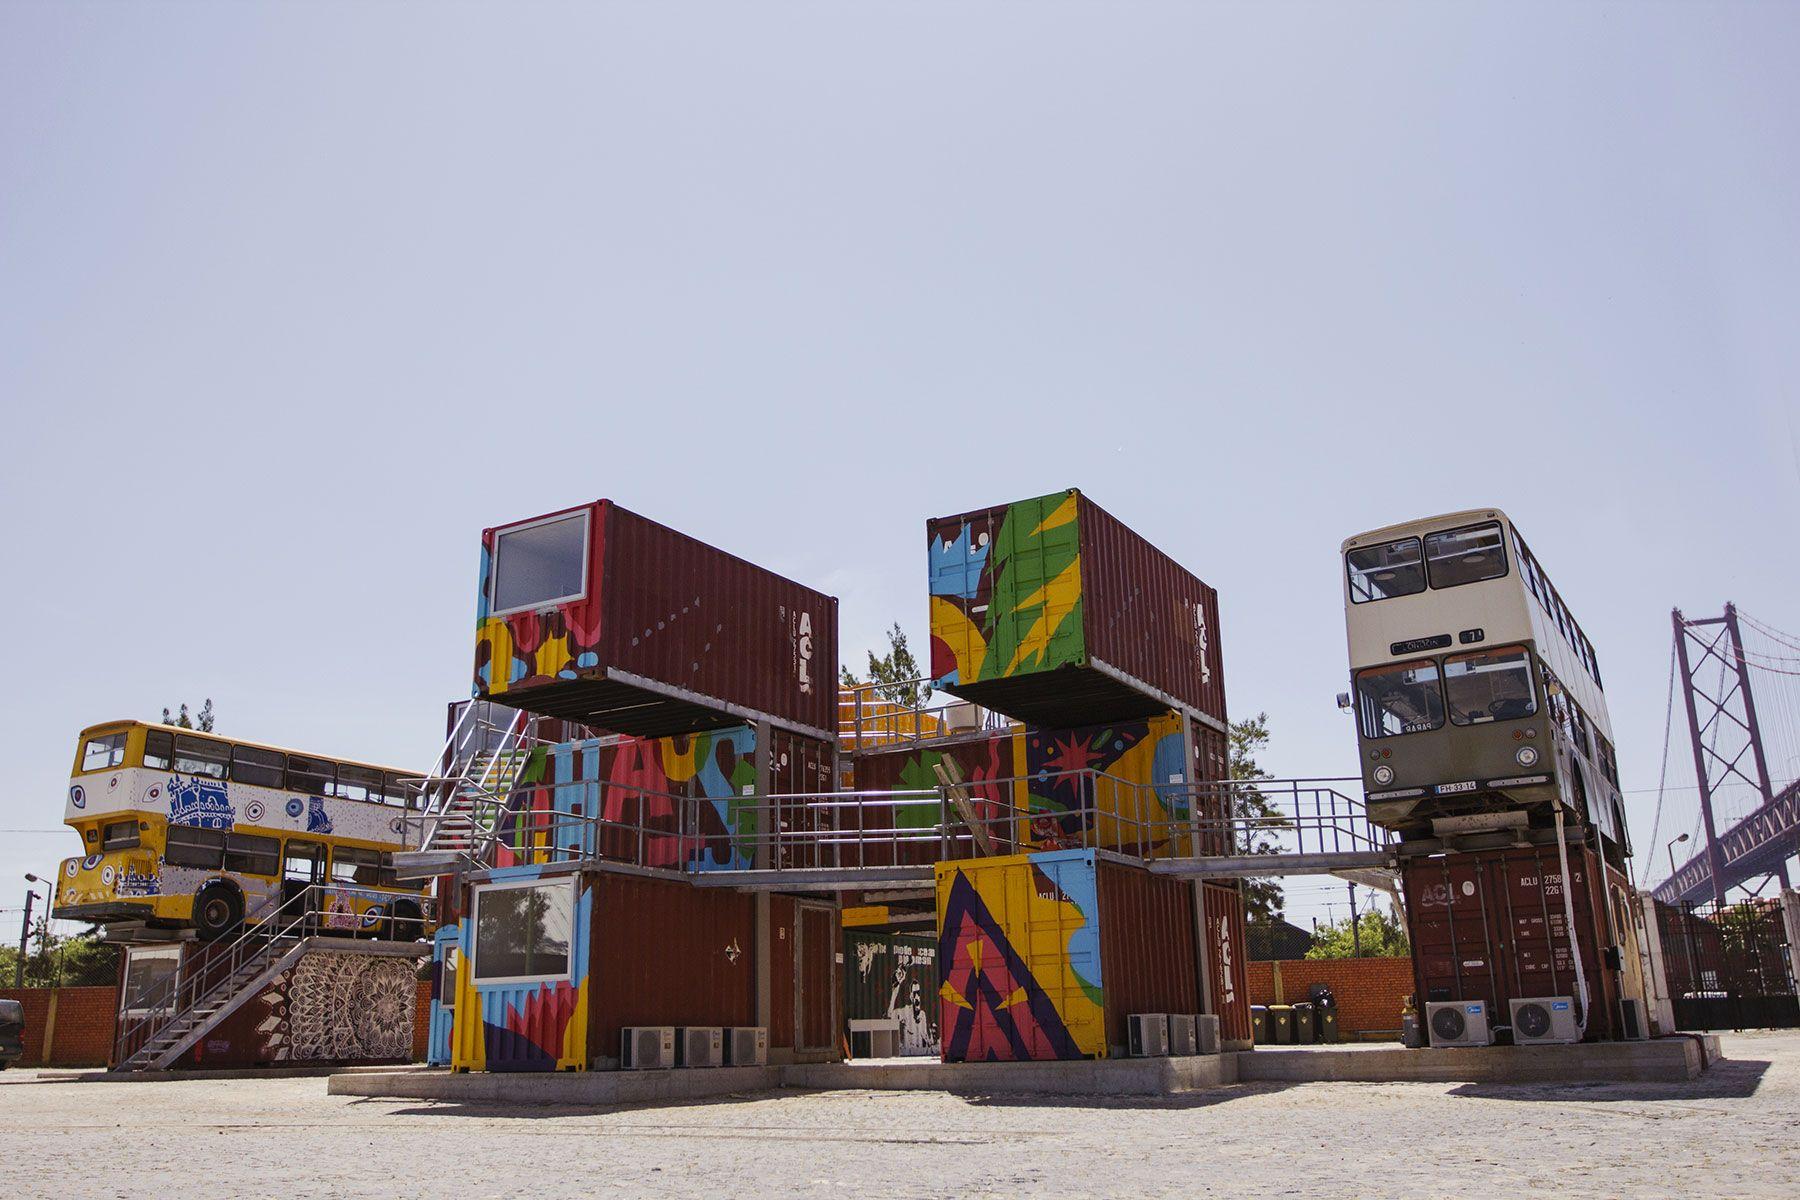 Village Underground, cowork space, Lisboa, by  João Cassiano Santos, Joana Astolfi #architecture #workspace #design #reuse #recycling #democraticdesign #container #lisboa #portugal